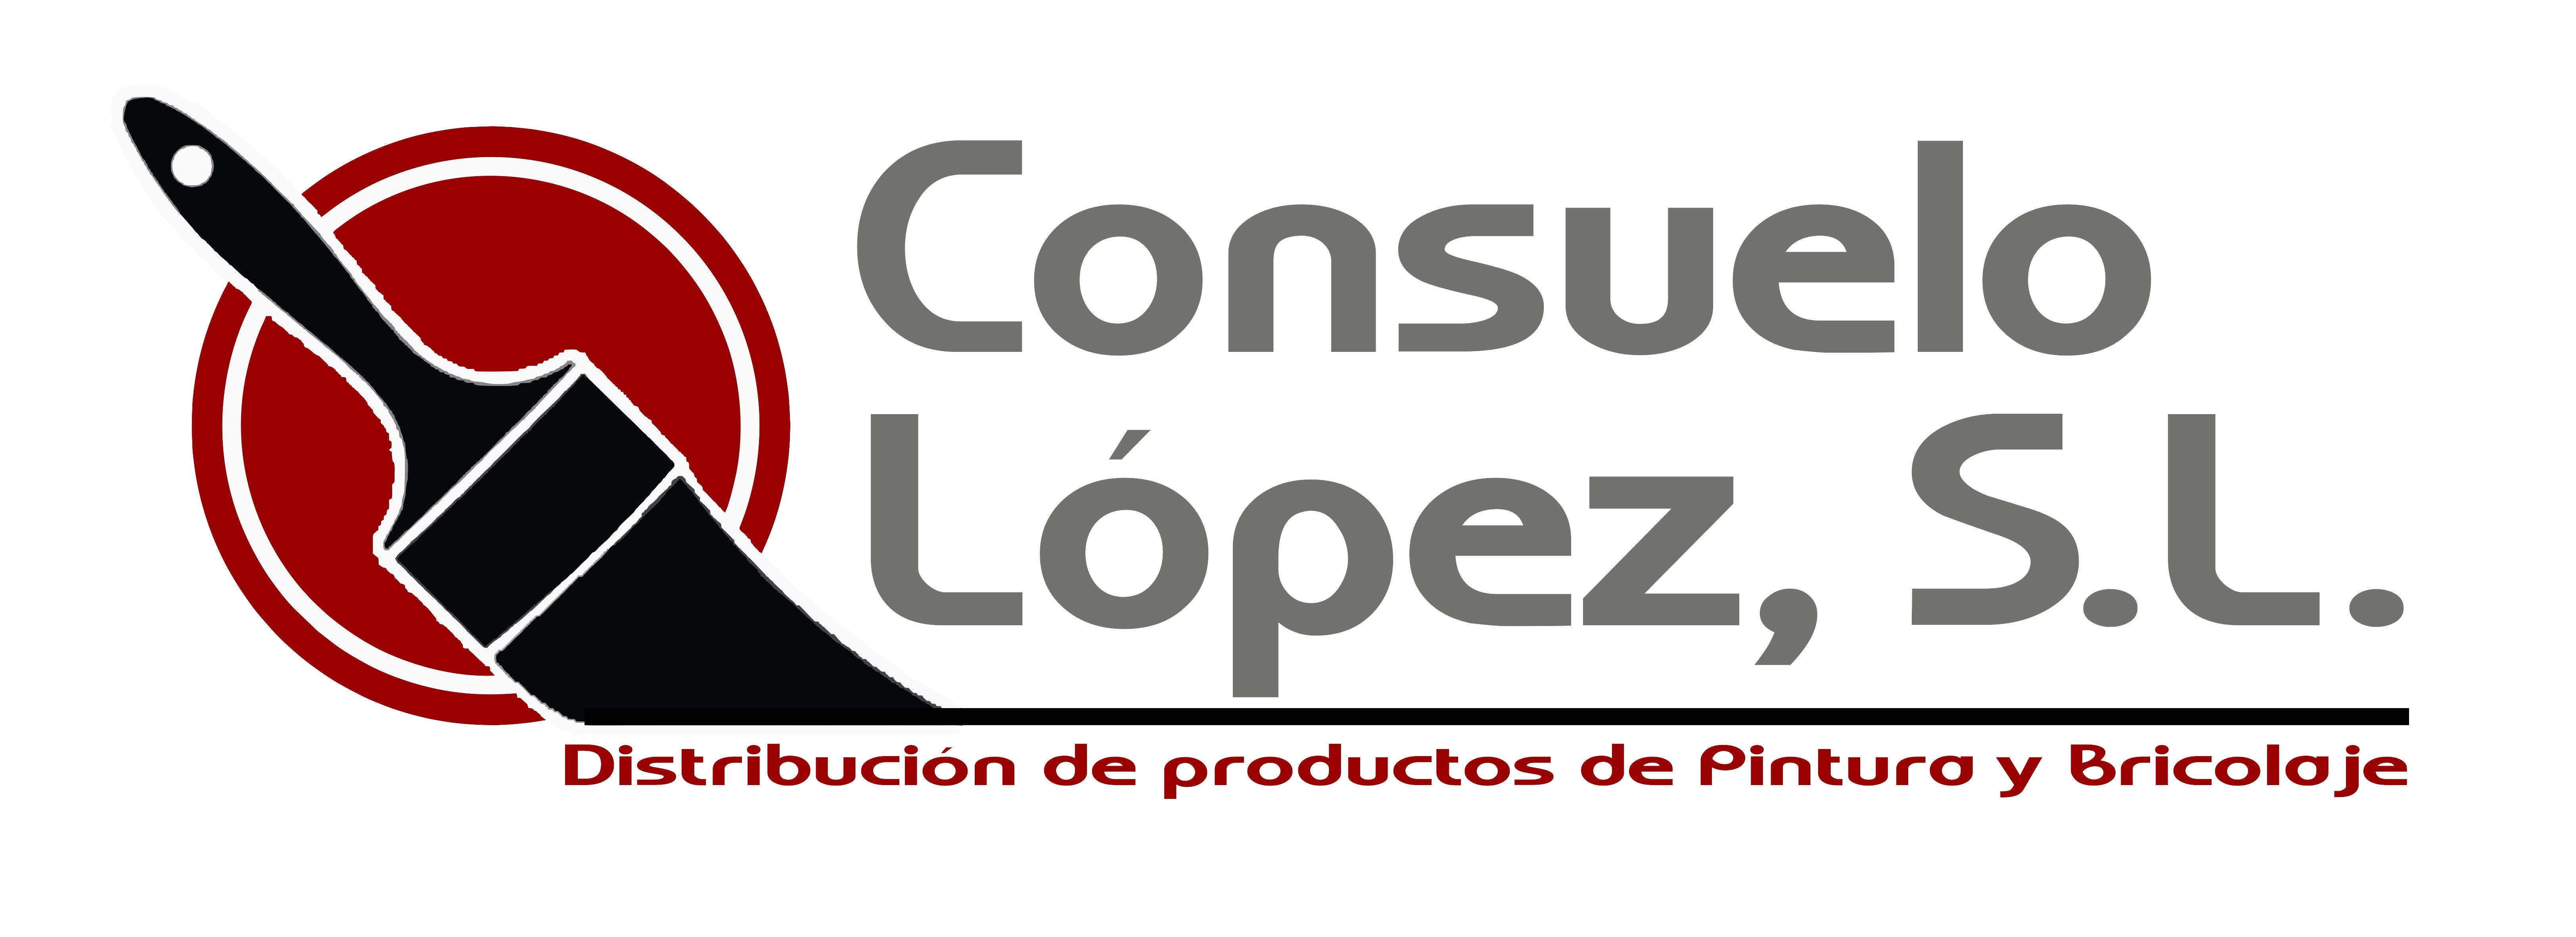 CONSUELO LOPEZ, S.L.